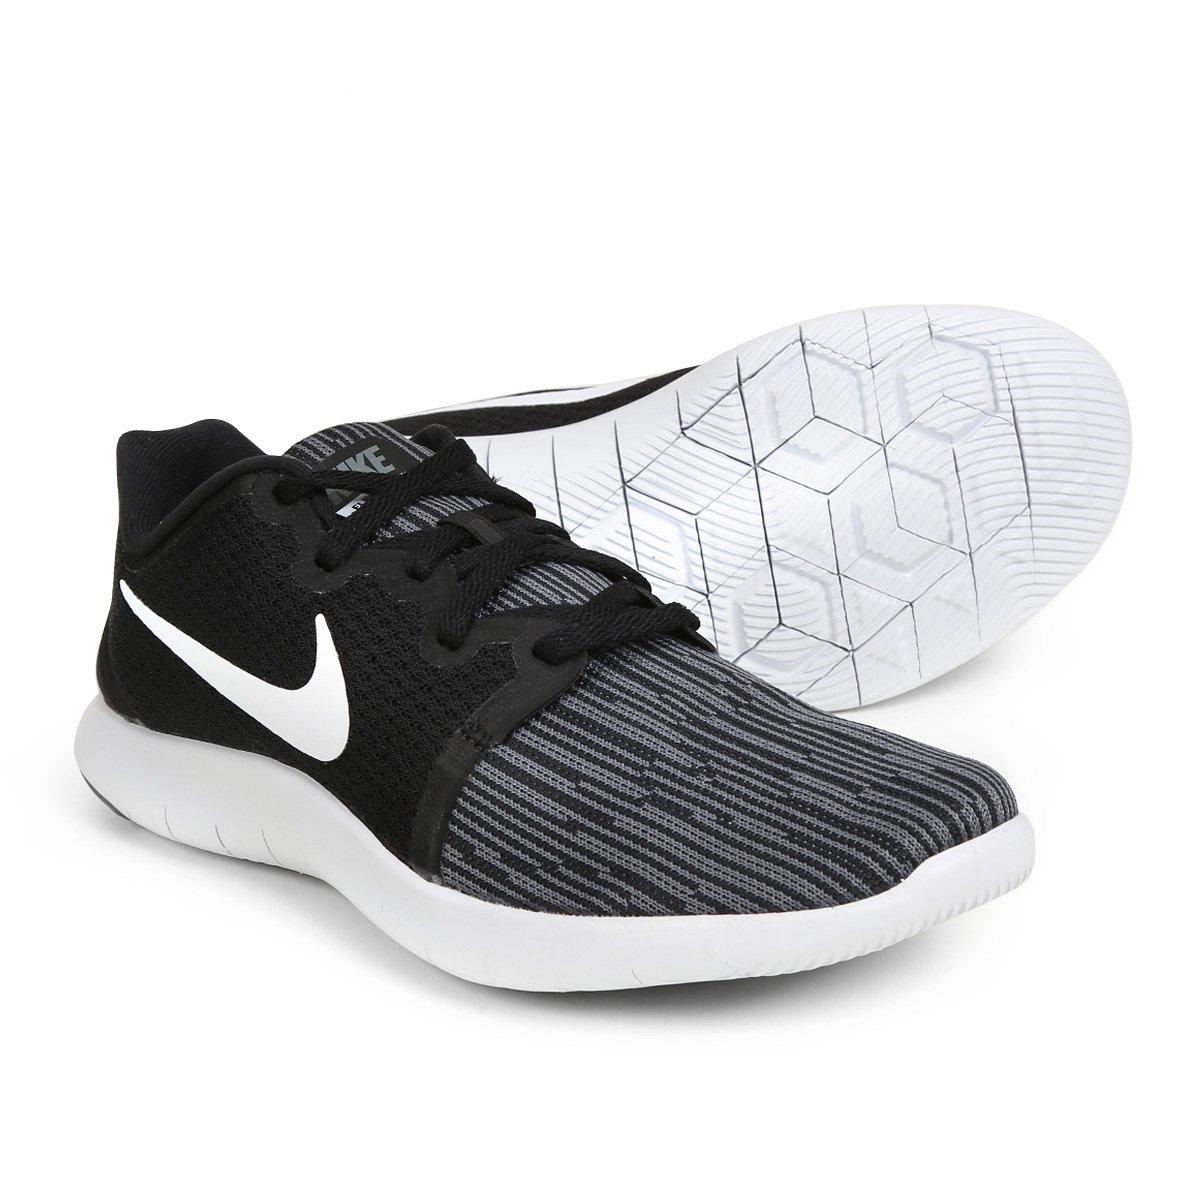 Reconocimiento tenaz Factor malo  Tênis Nike Flex Contact 2 Feminino | Loja do Inter